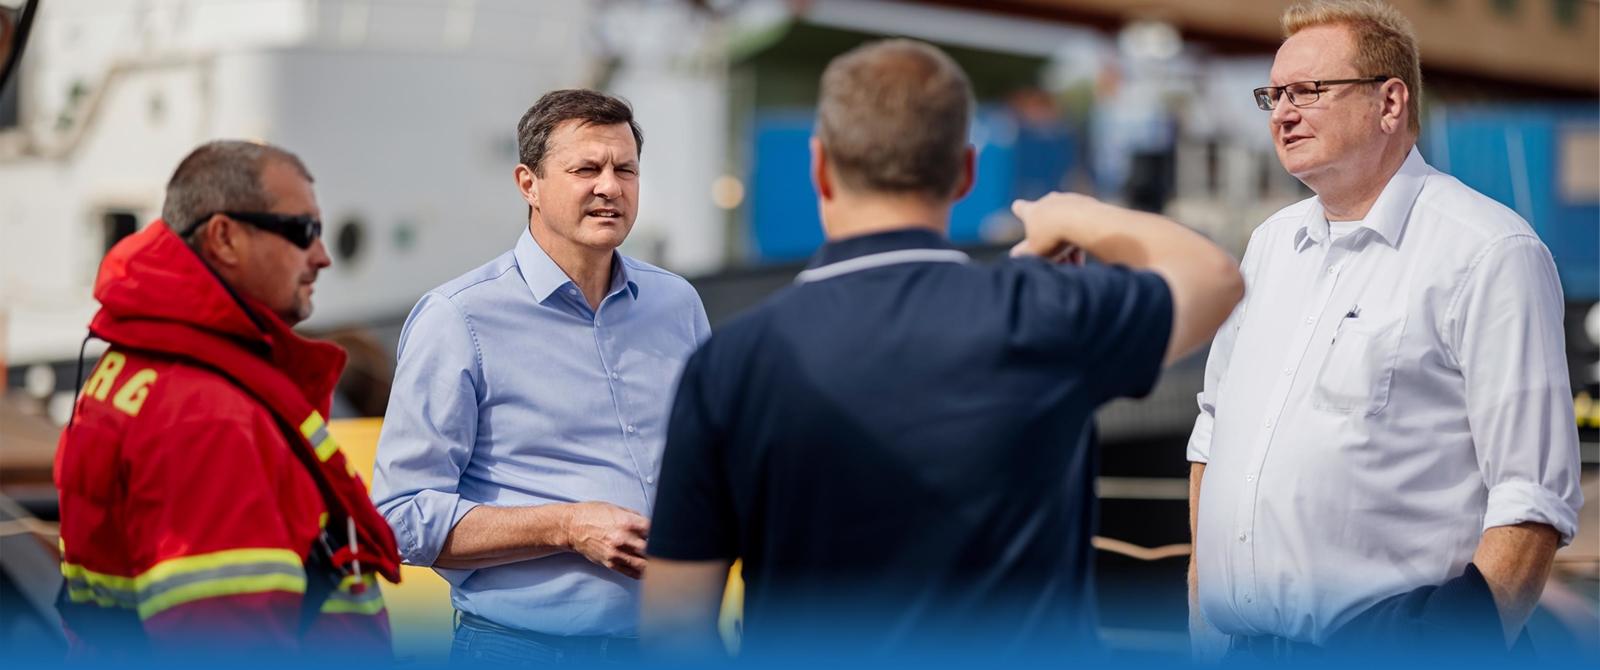 slider-oliver-grundmann-2021-bundestagswahlen-stade-rotenburg-bremervoerde (35)